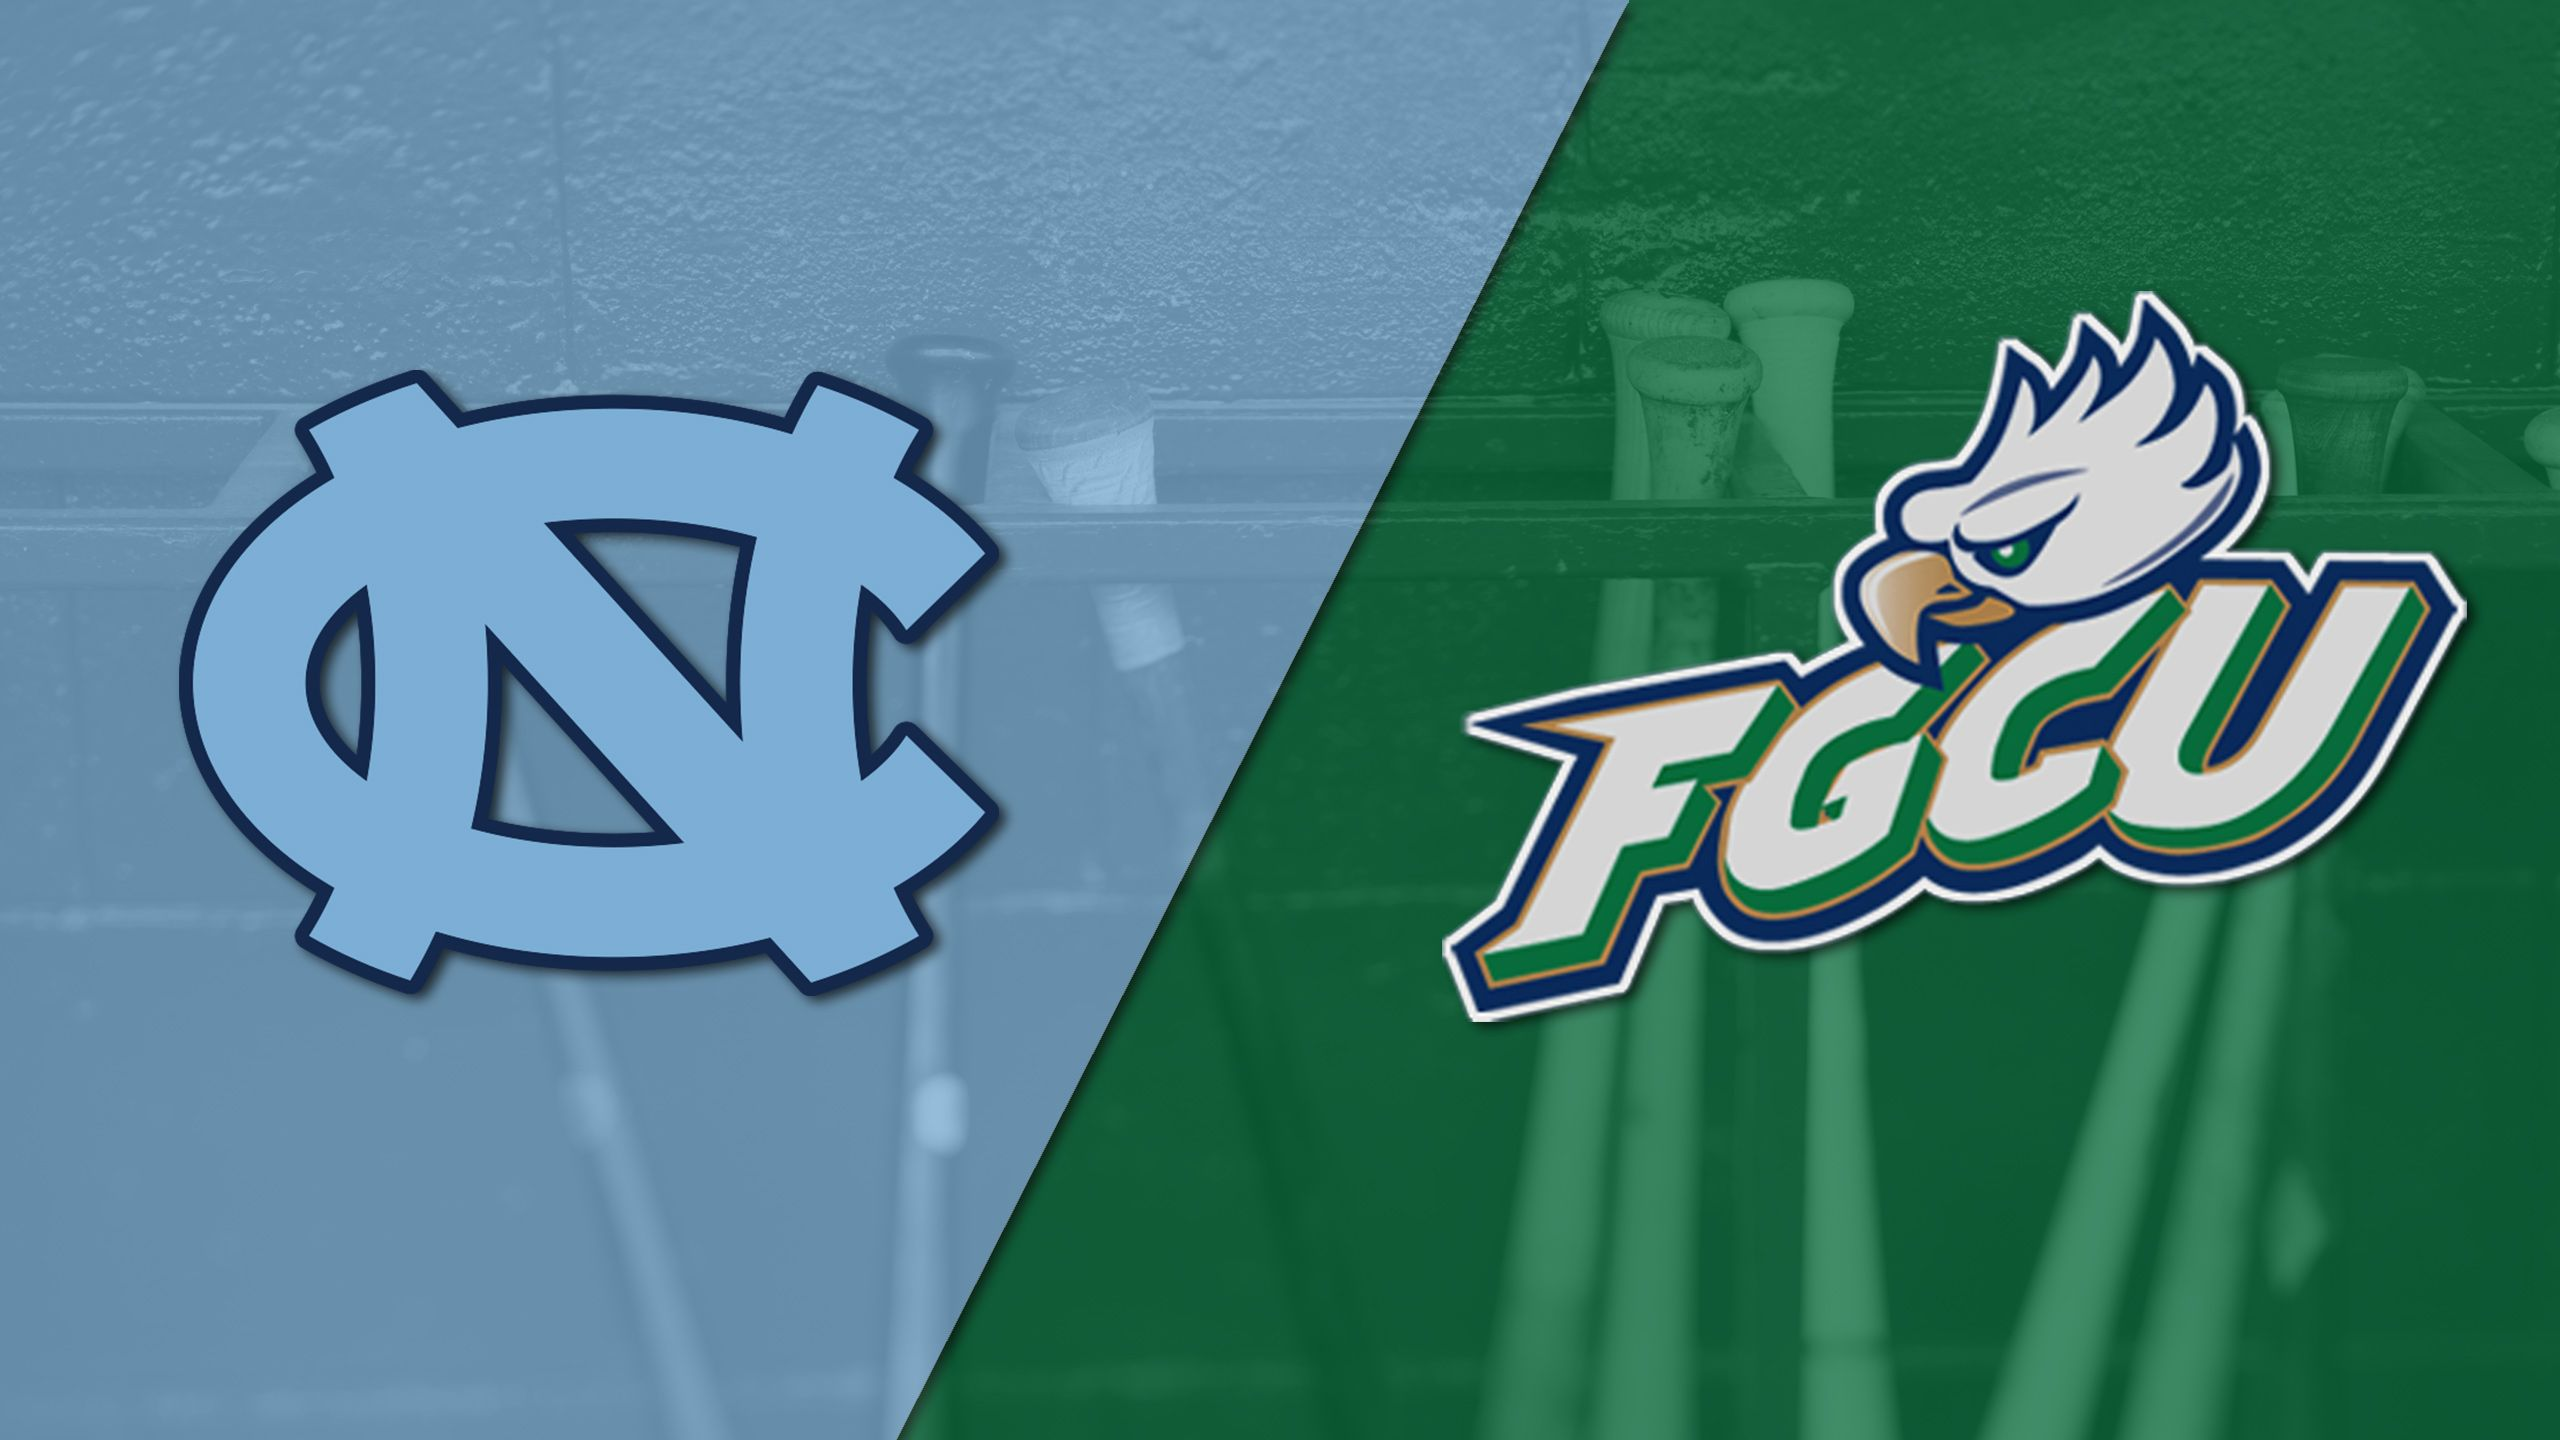 #2 North Carolina vs. Florida Gulf Coast (Site 9 / Game 5) (NCAA Baseball Championship)